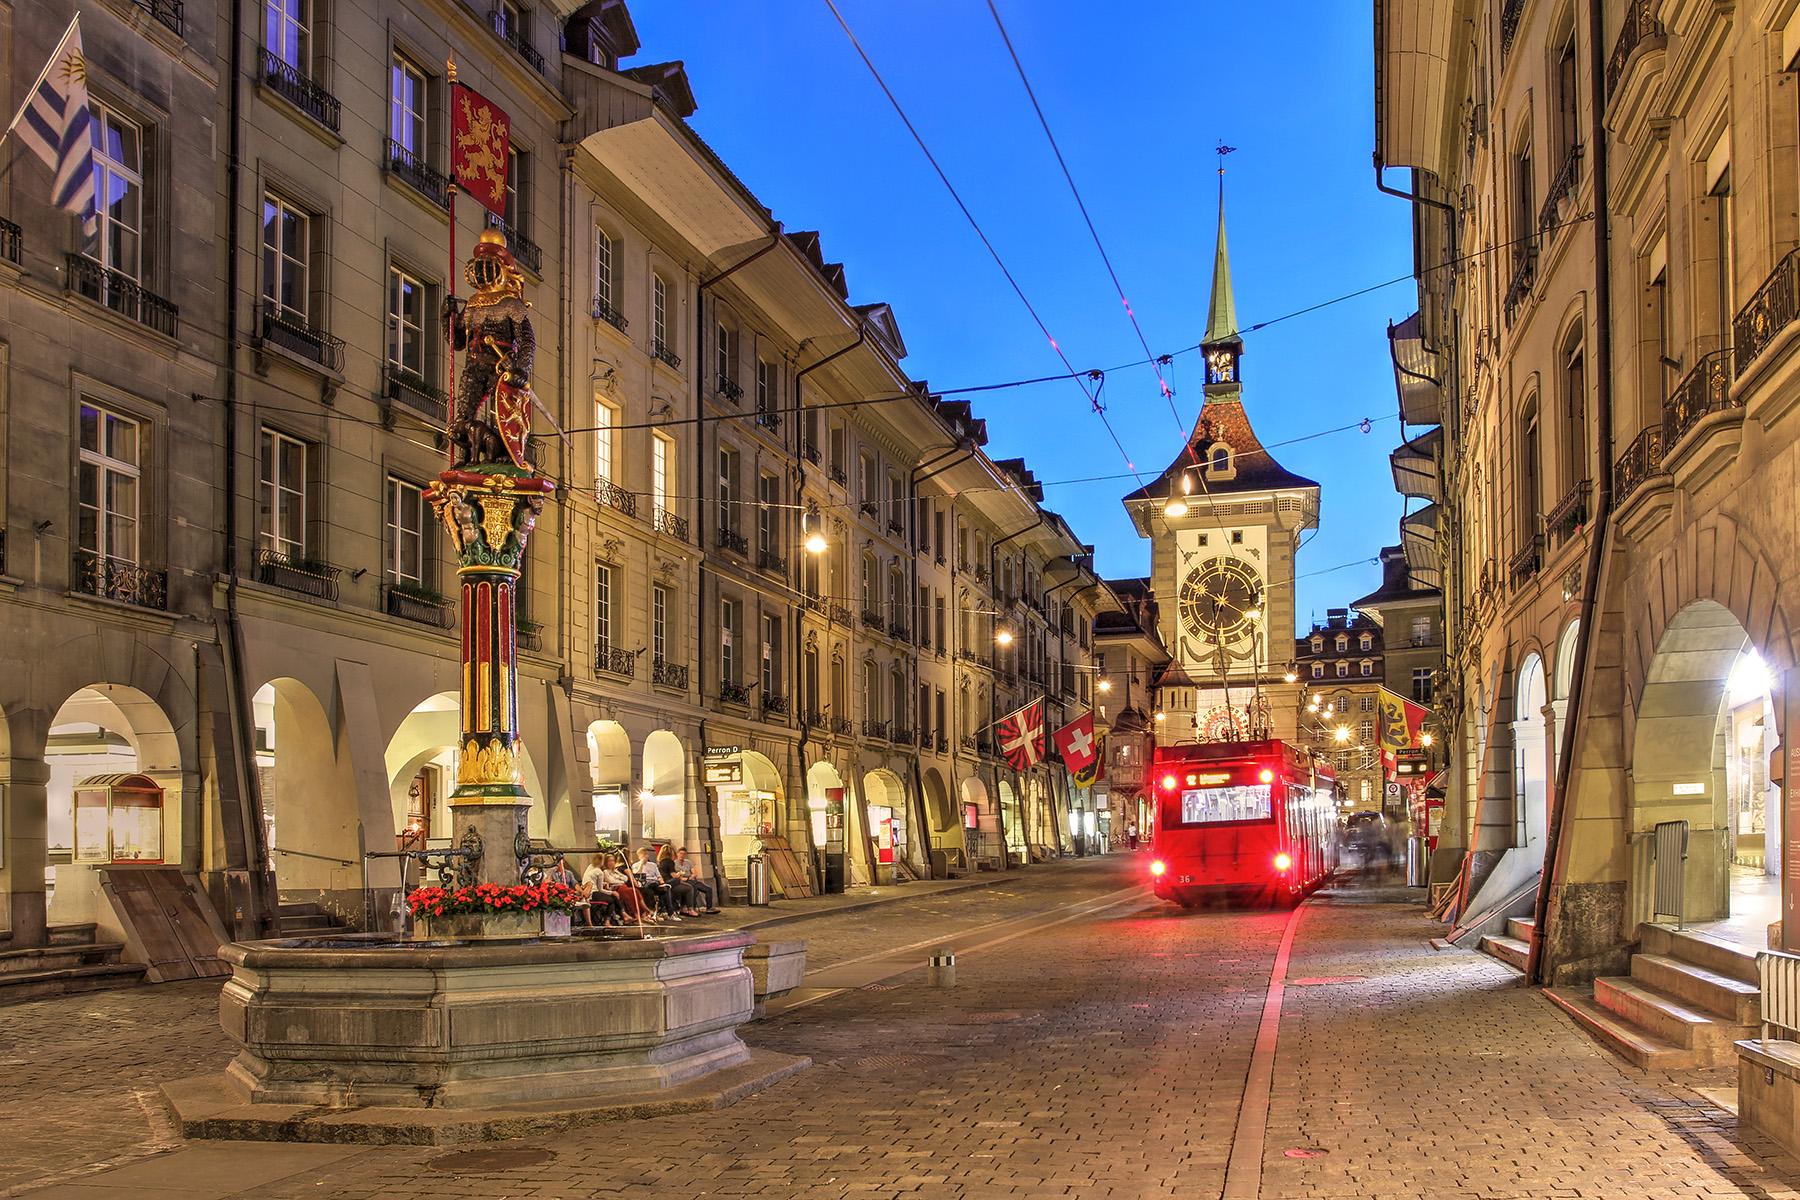 A nighttime view of Kramgasse in Bern